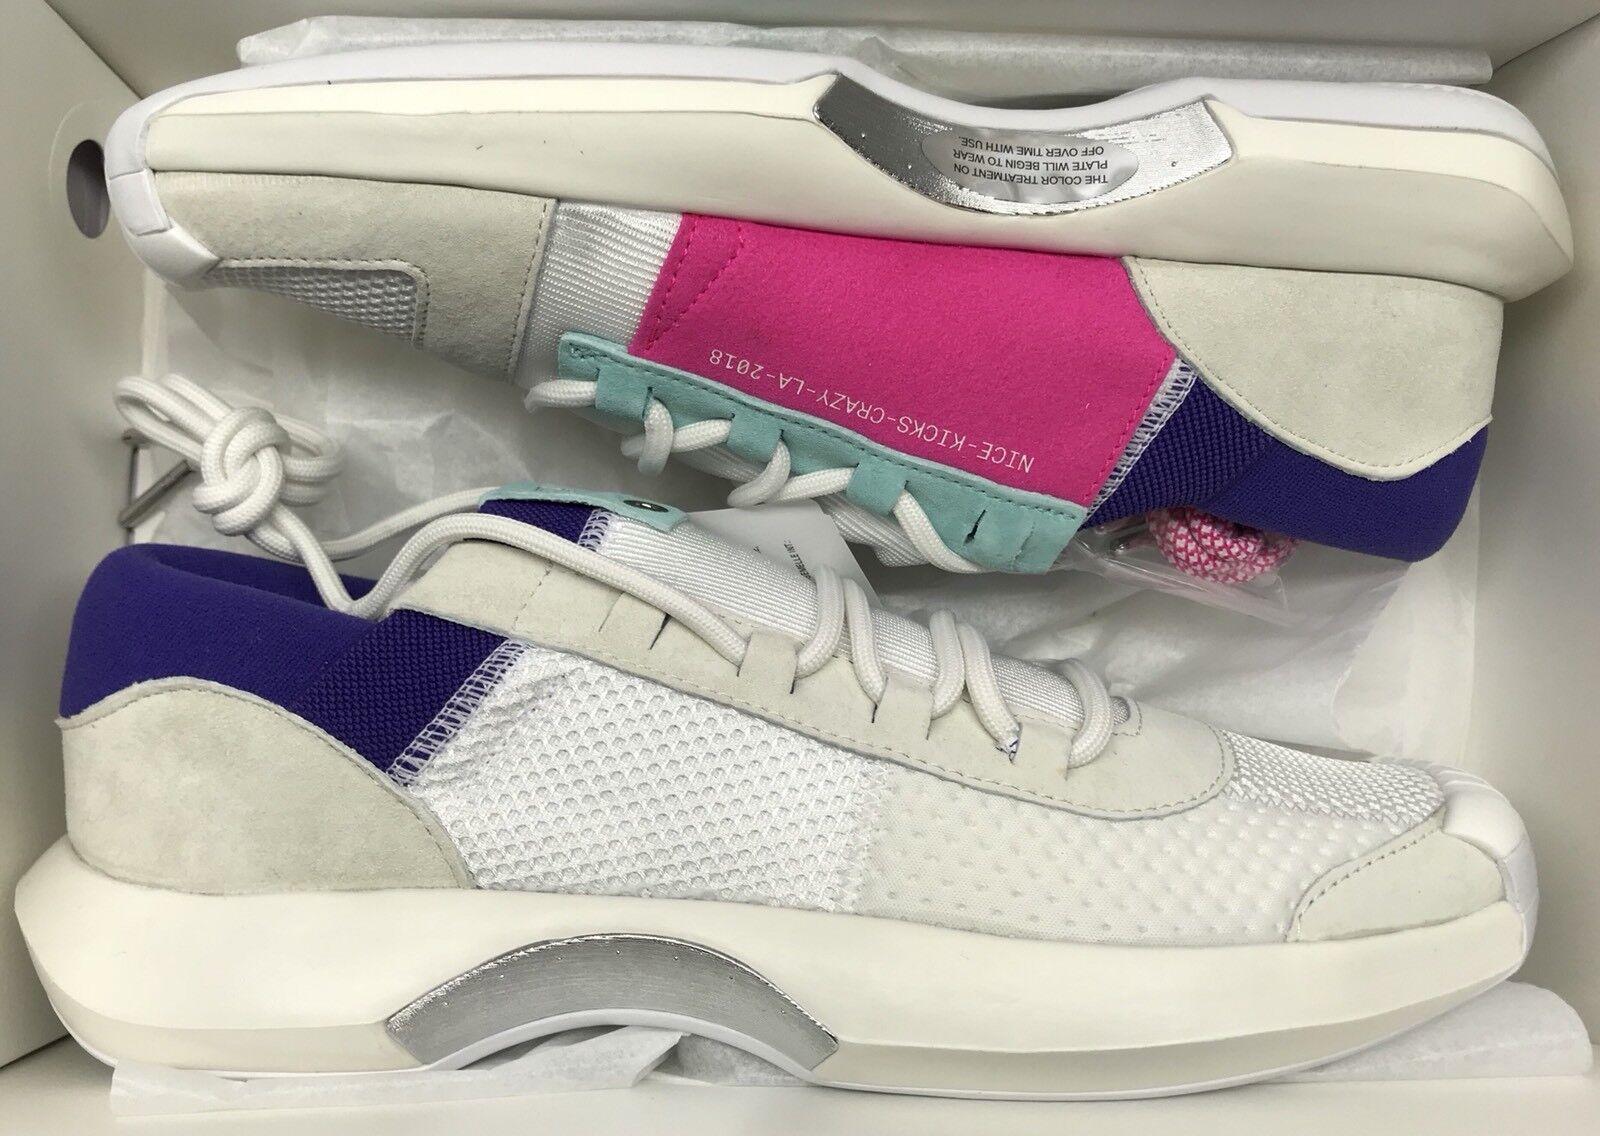 Adidas Crazy 1 ADV NICEKICKS Off White Aqua Pink Consortium NMD DB1786 Sz 8.5